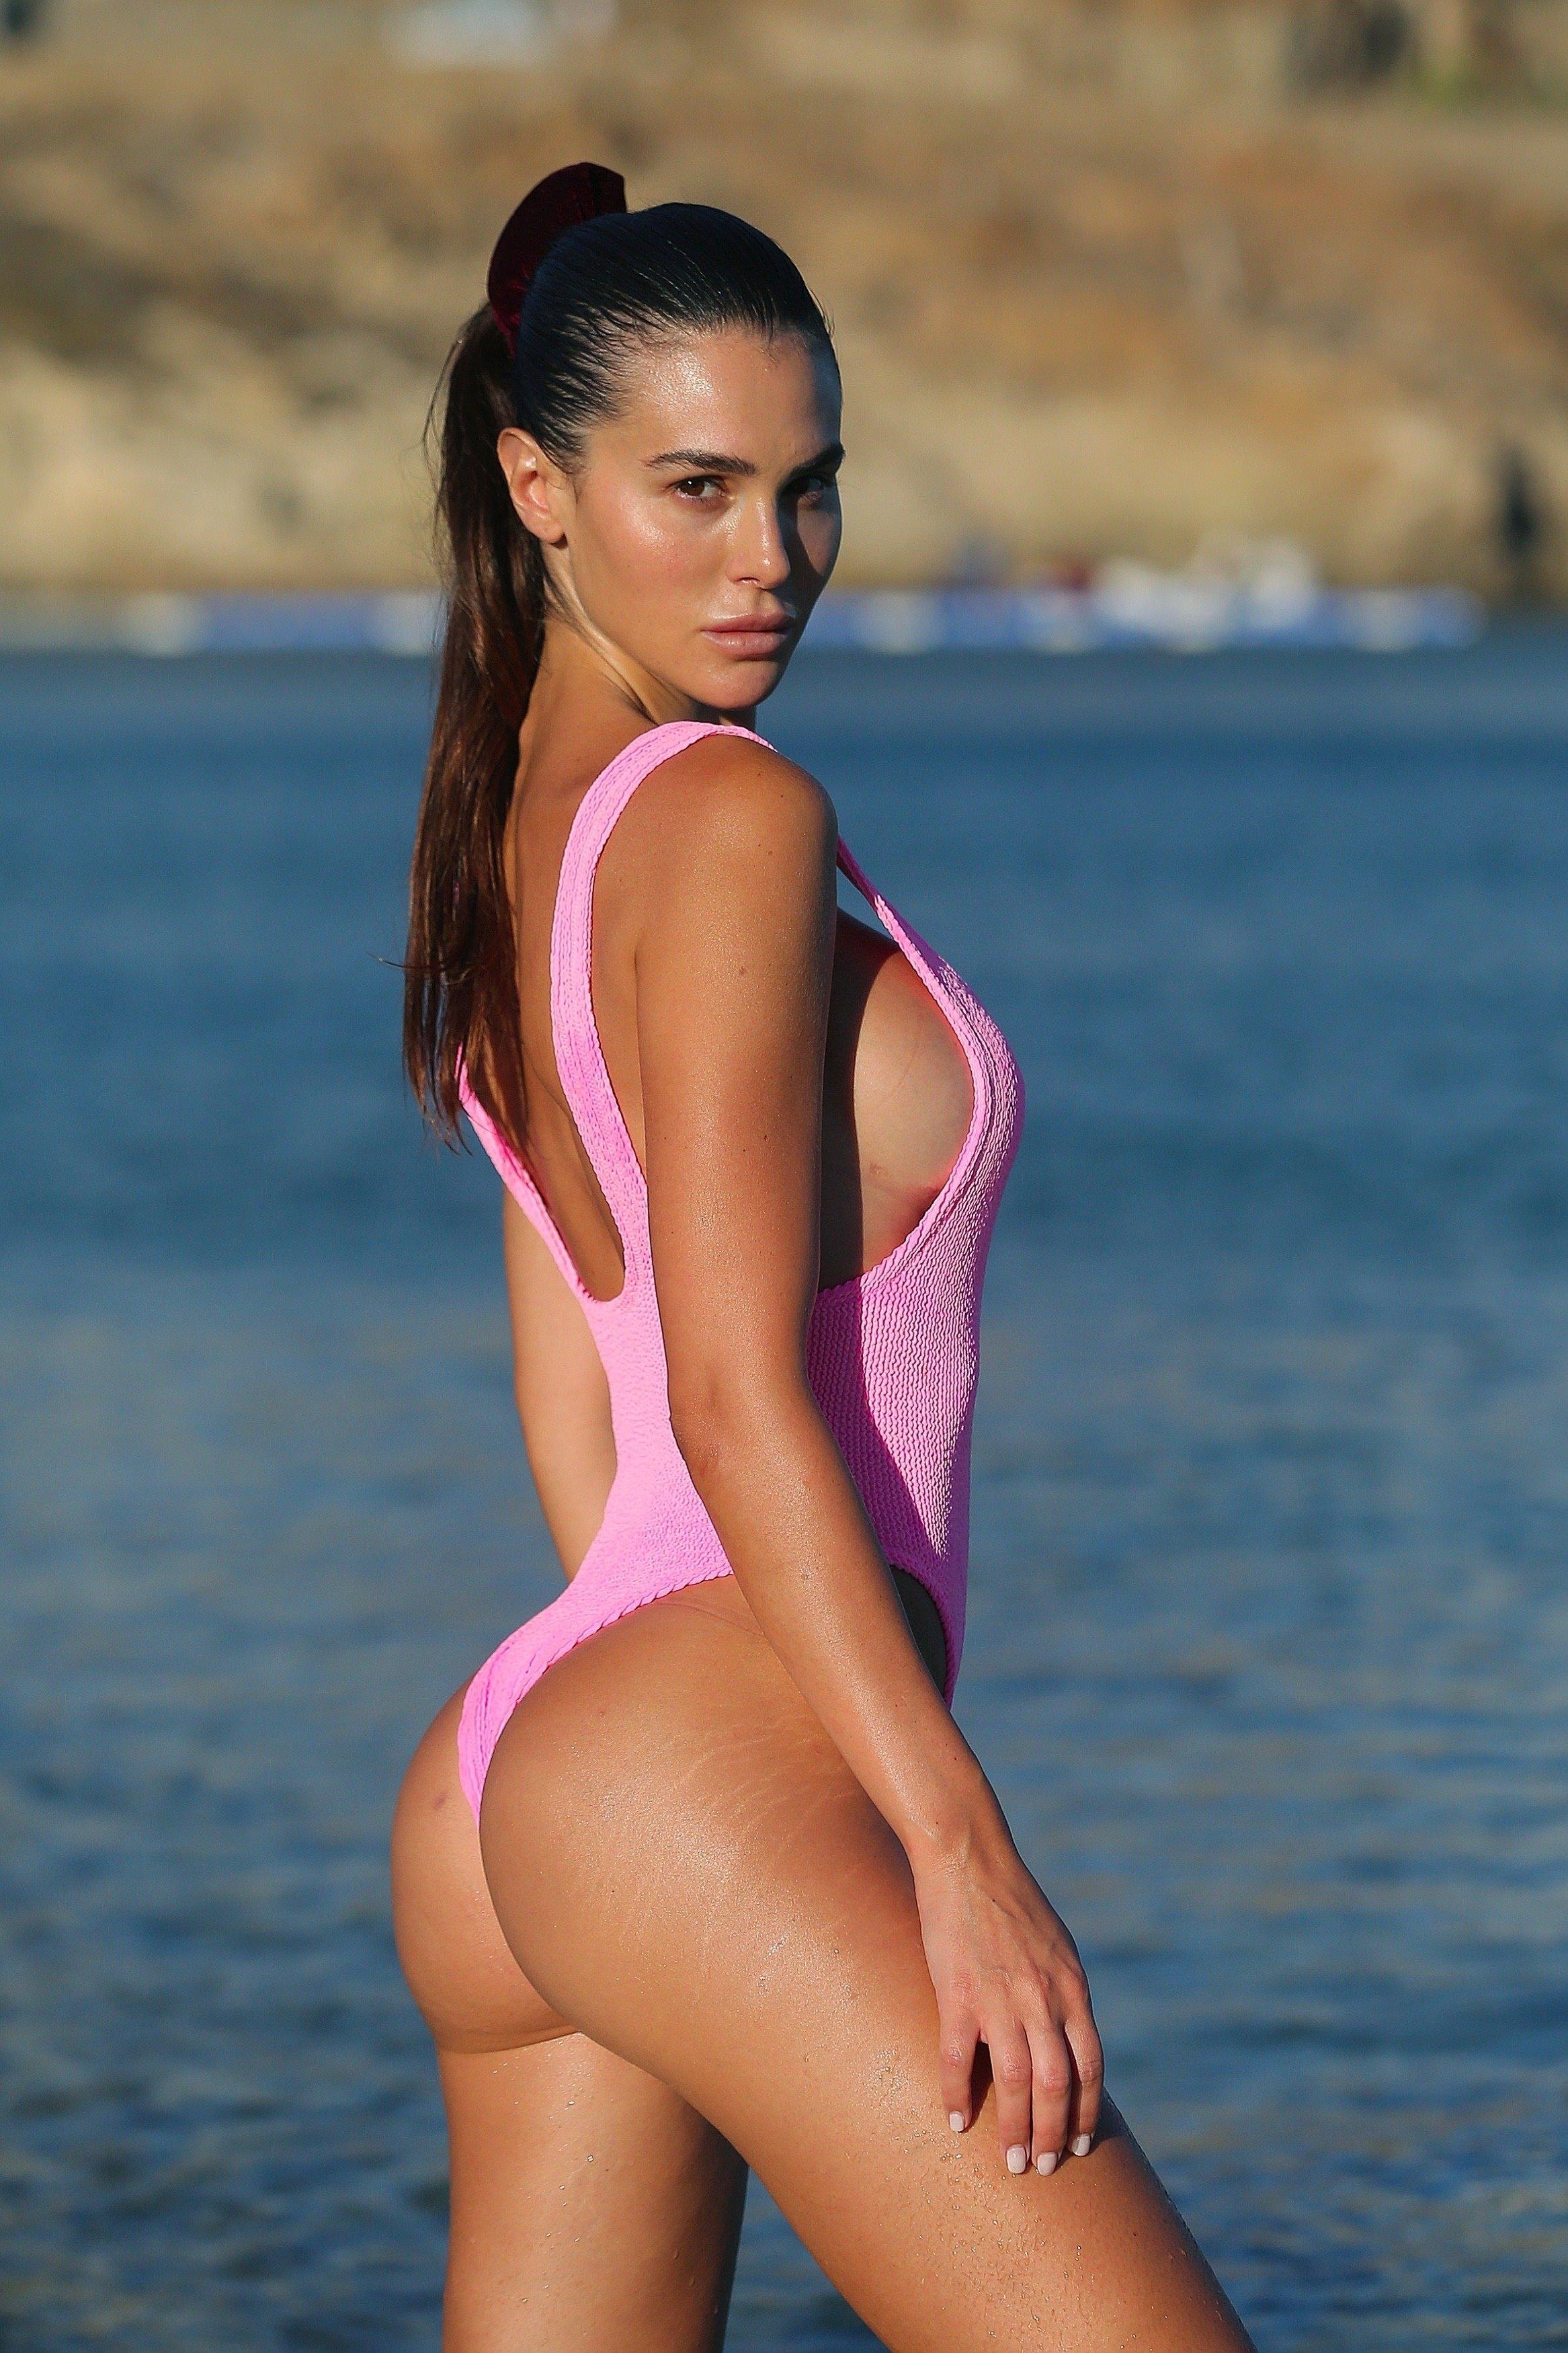 Pussy Silvia Caruso nudes (65 photo), Sexy, Sideboobs, Feet, in bikini 2019